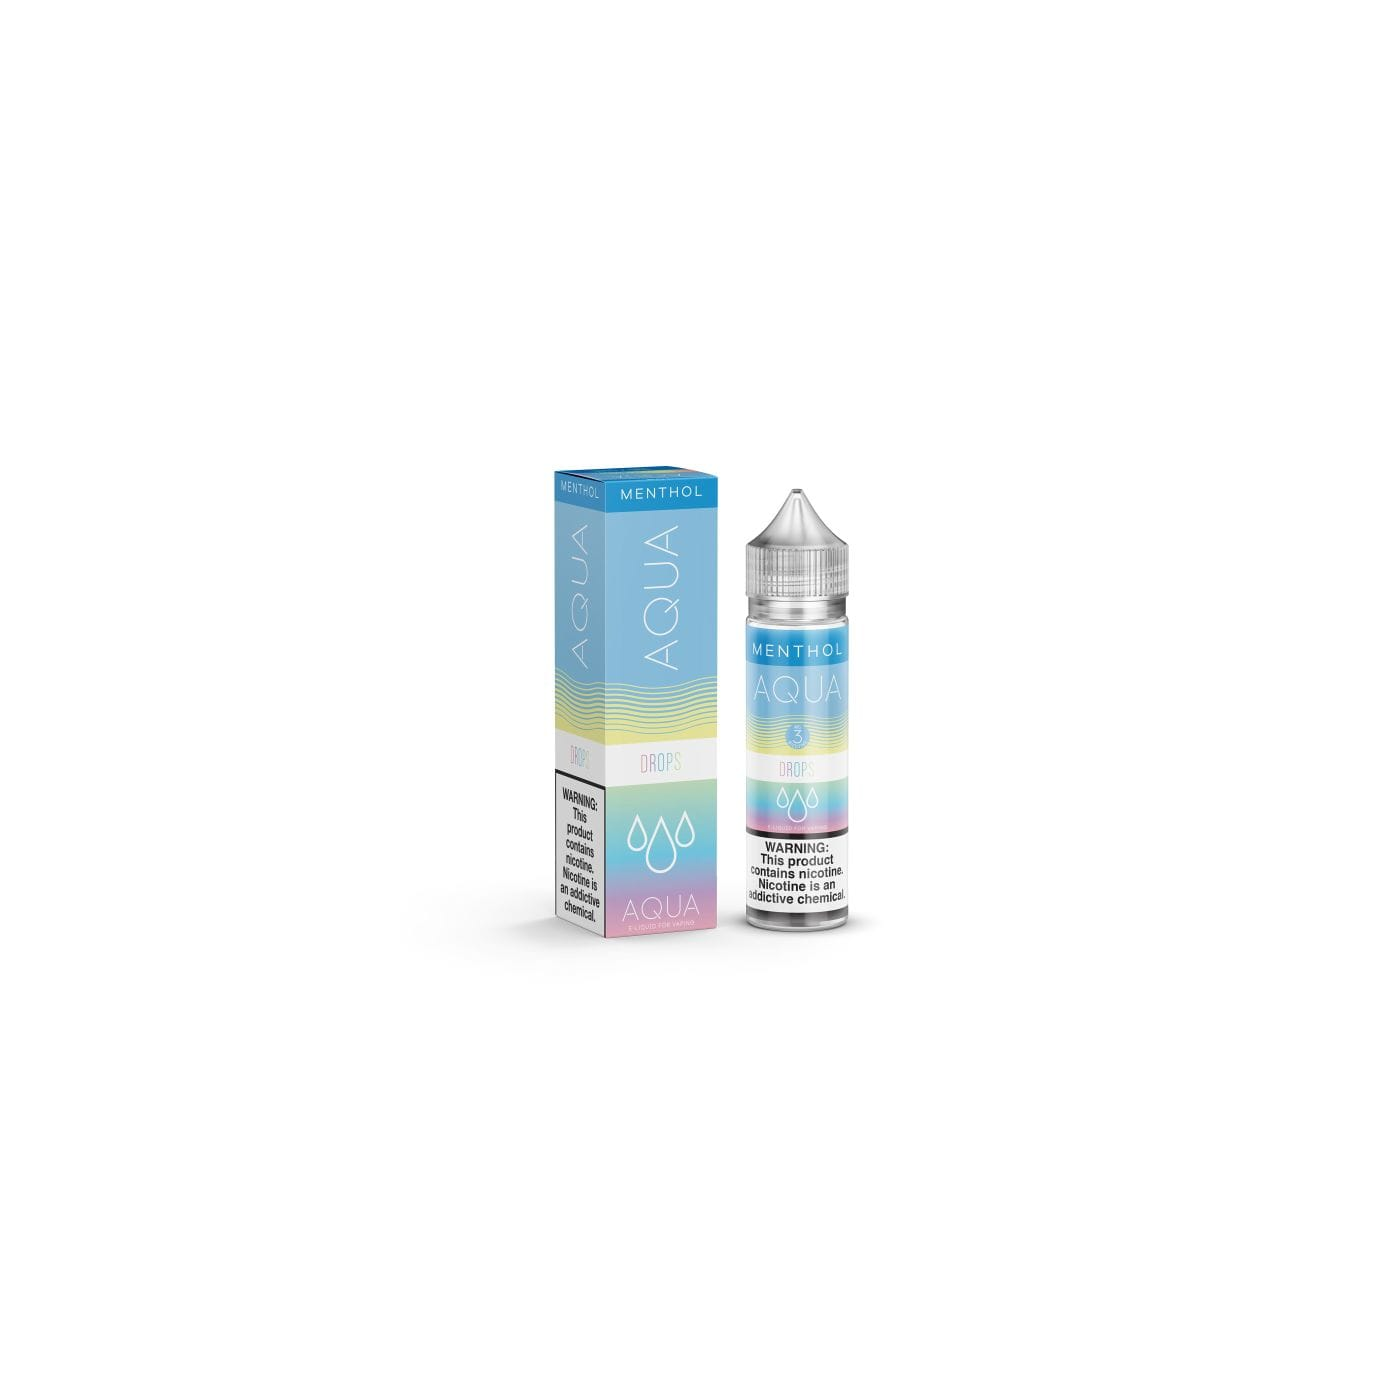 Aqua Drops Menthol Synthetic Nicotine